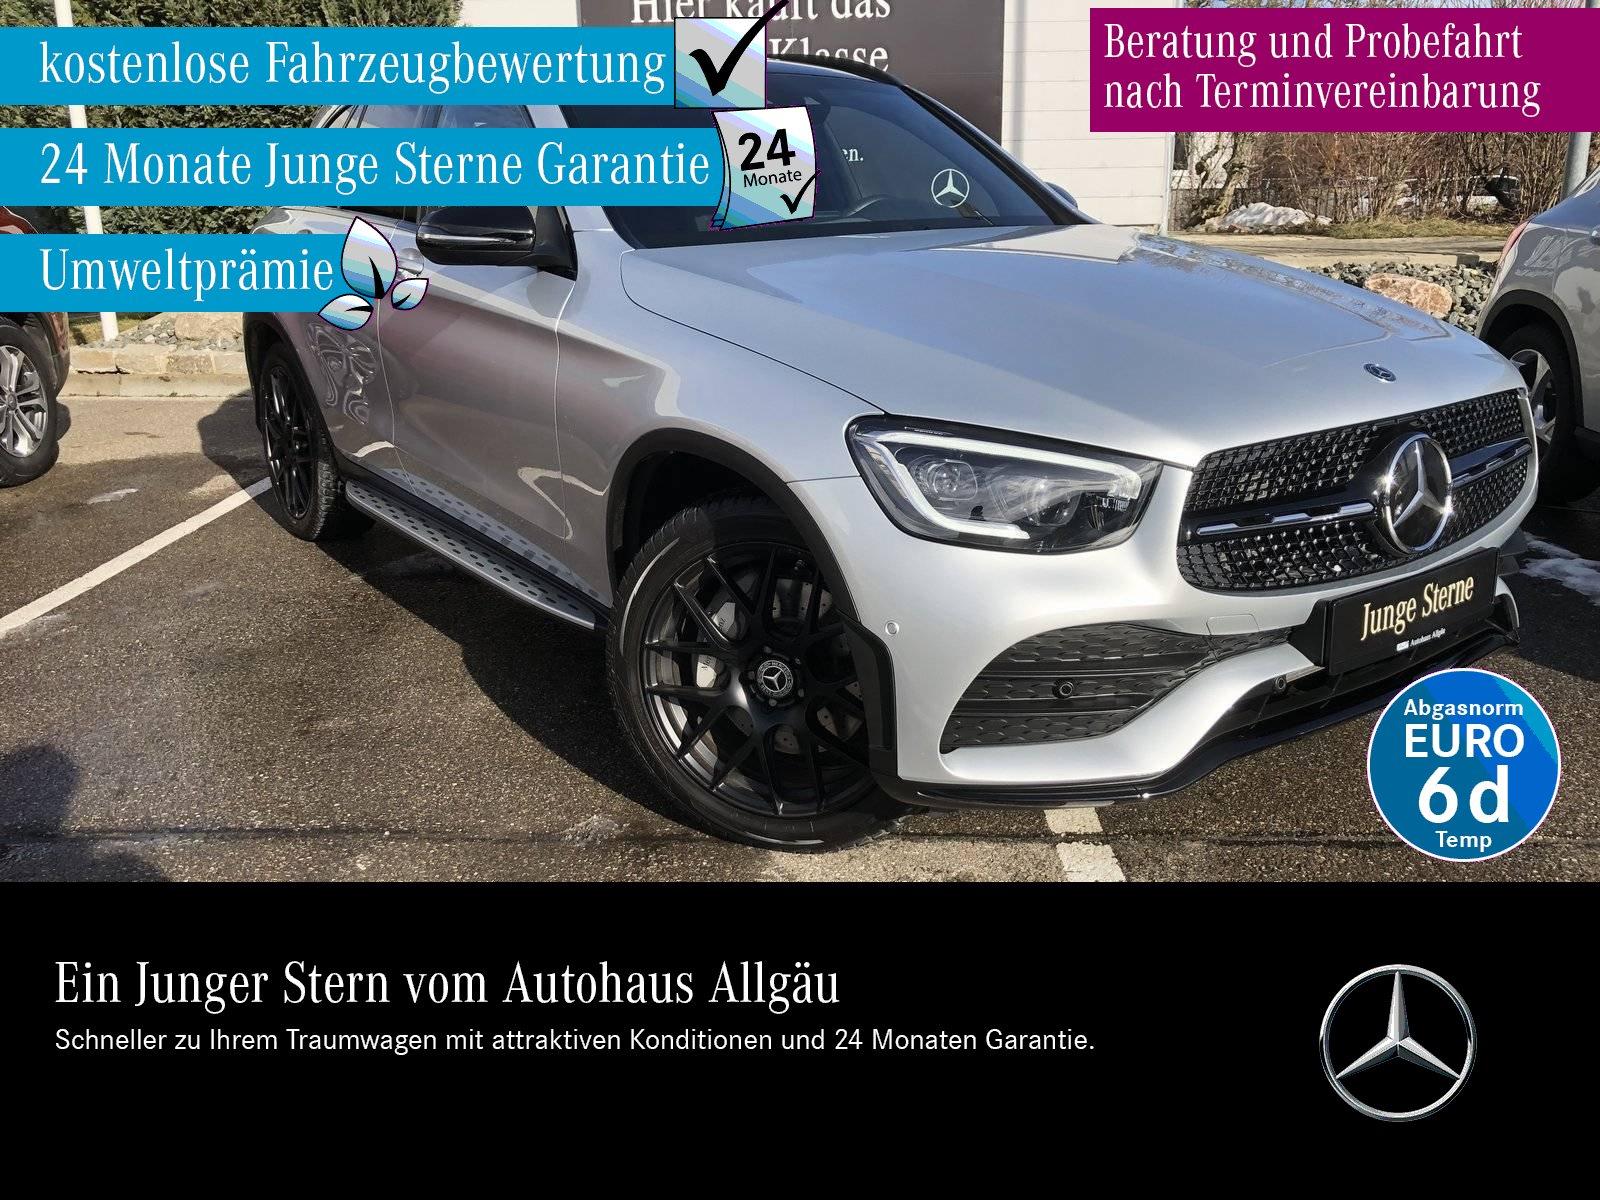 Mercedes-Benz GLC 400d4M AMGLine+Panodach+Burmester+Distronic+, Jahr 2020, Diesel